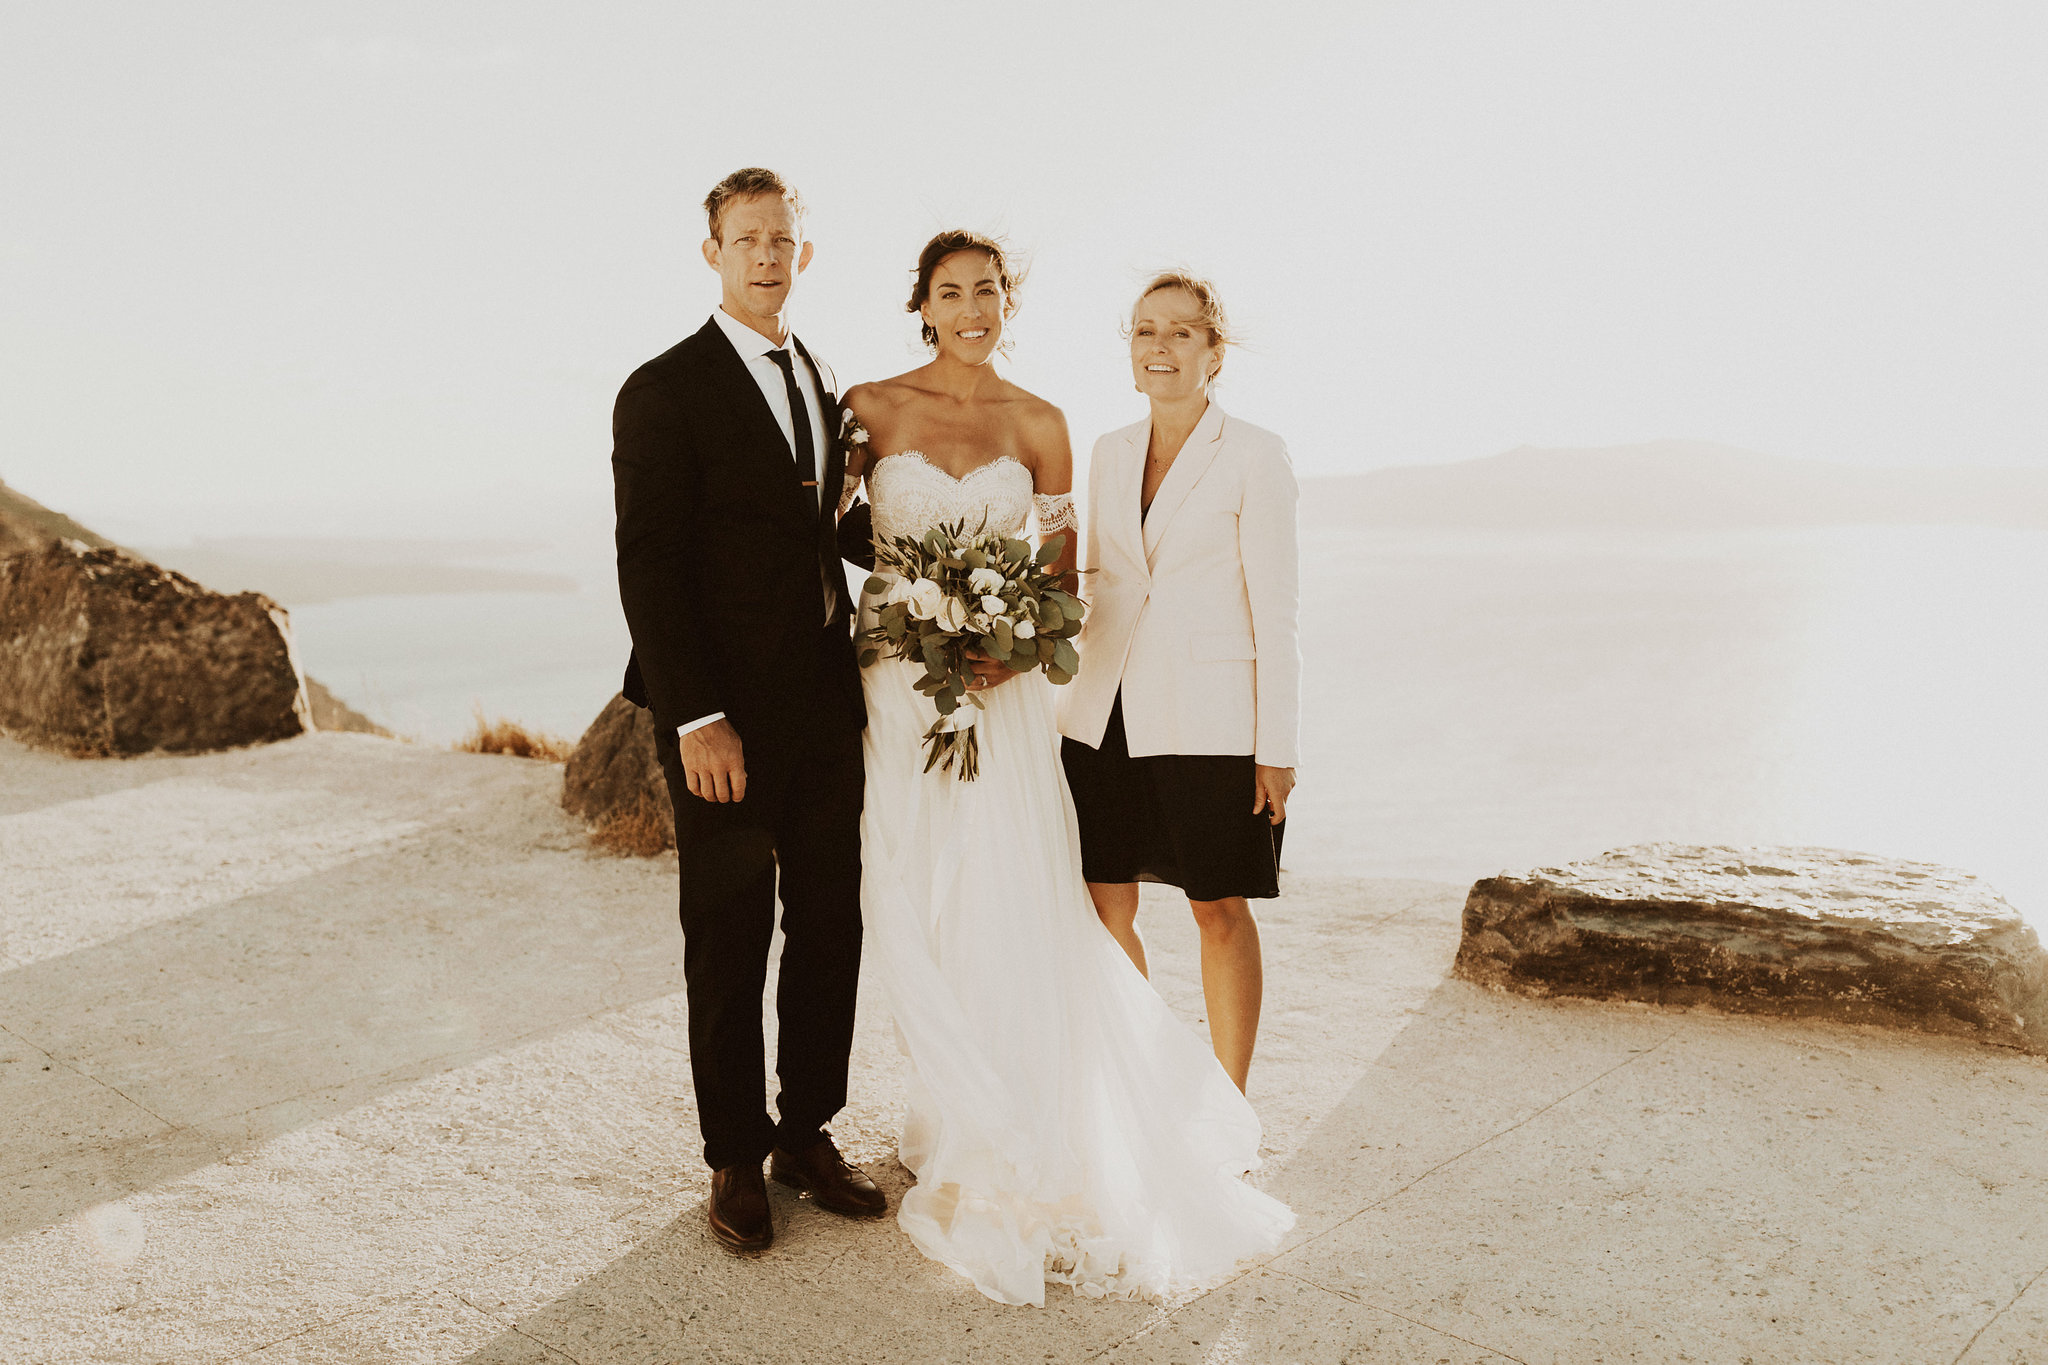 Santorini destination wedding celebrant